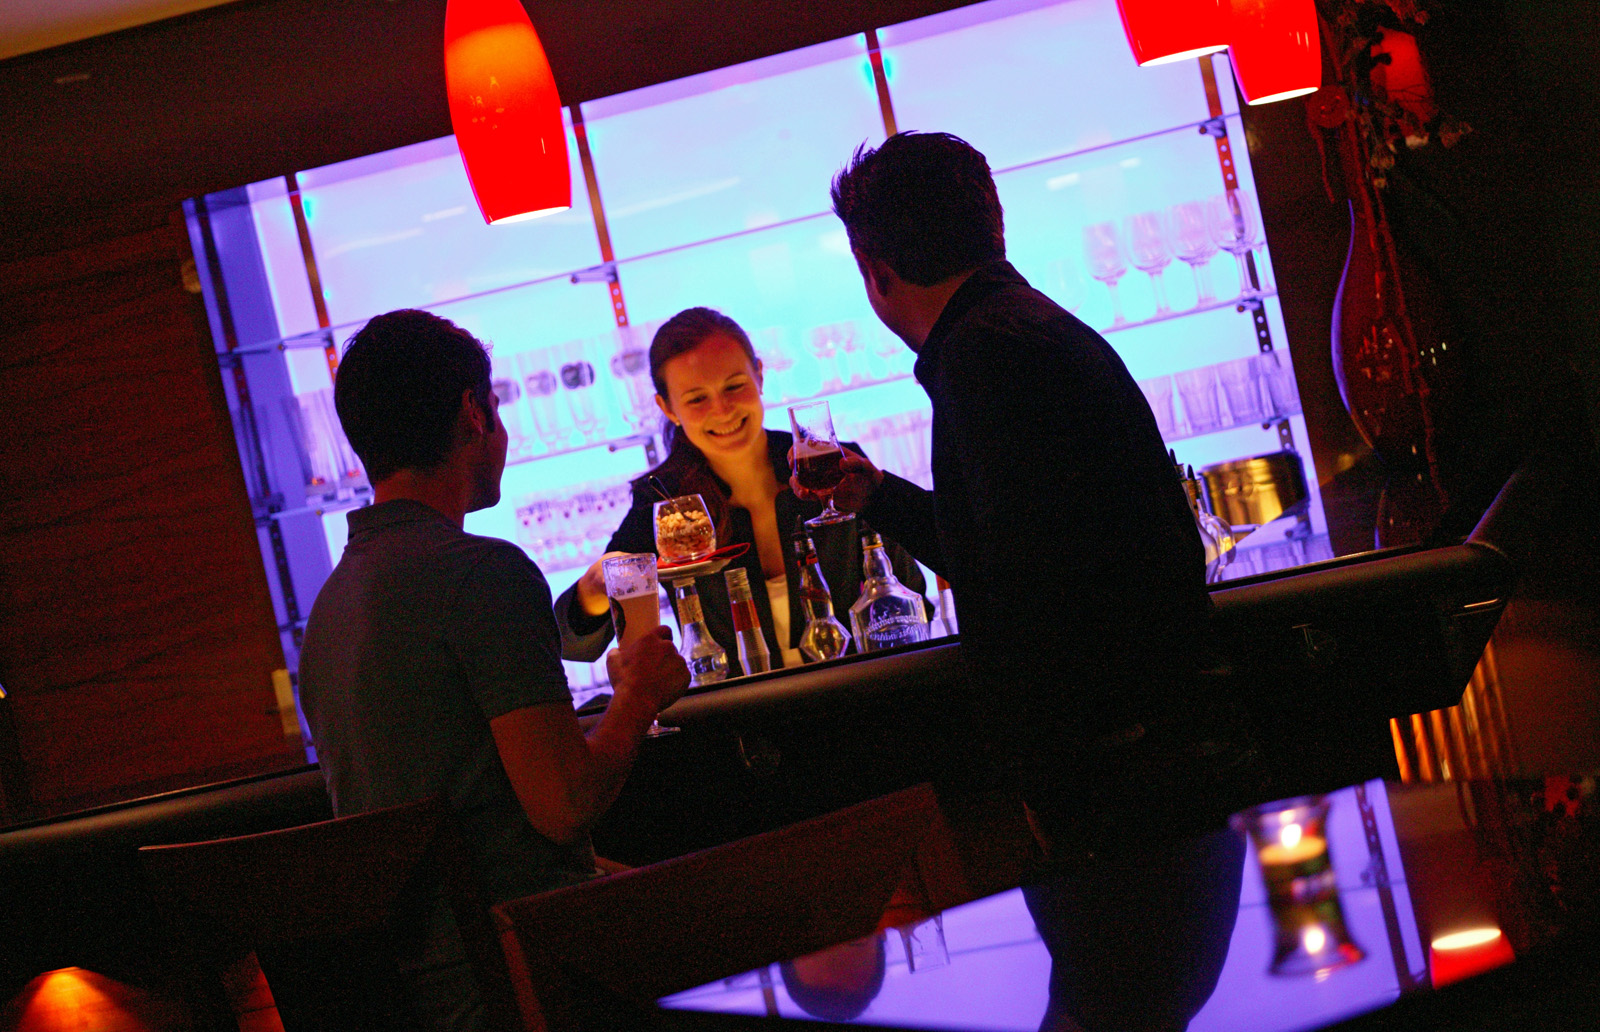 Bar - Hotel Sonne, Rudersberg/schlechtbach